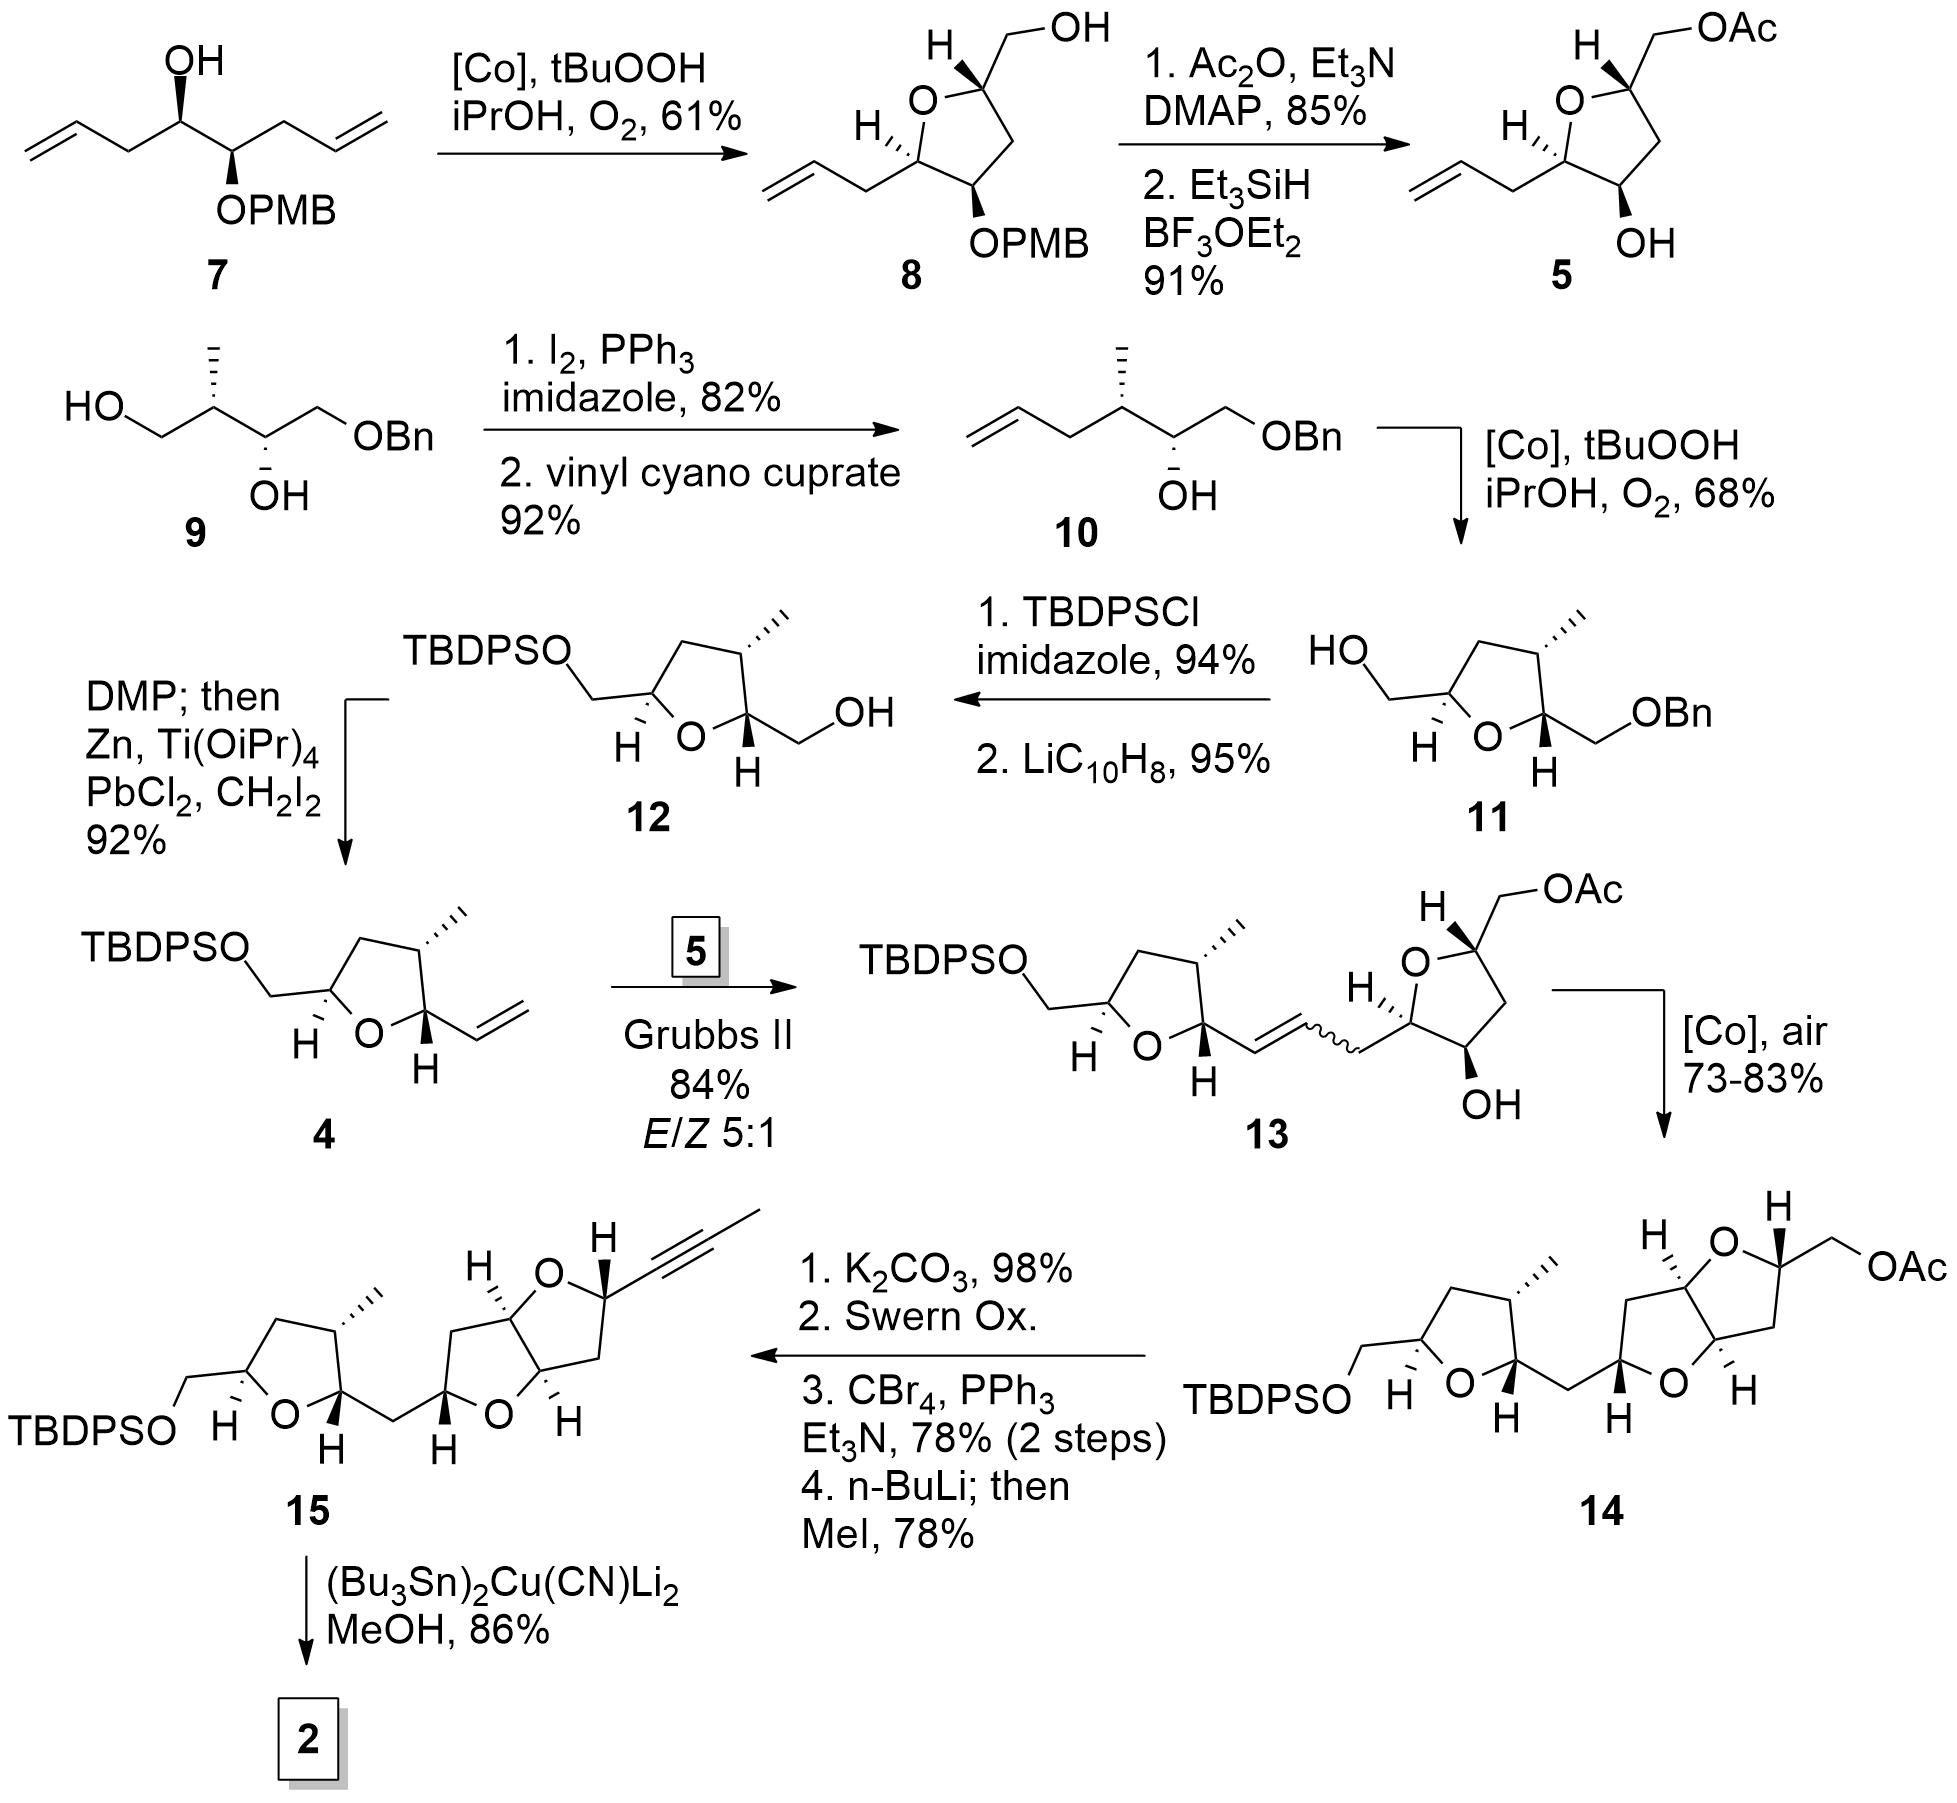 amphirionin2-2.png